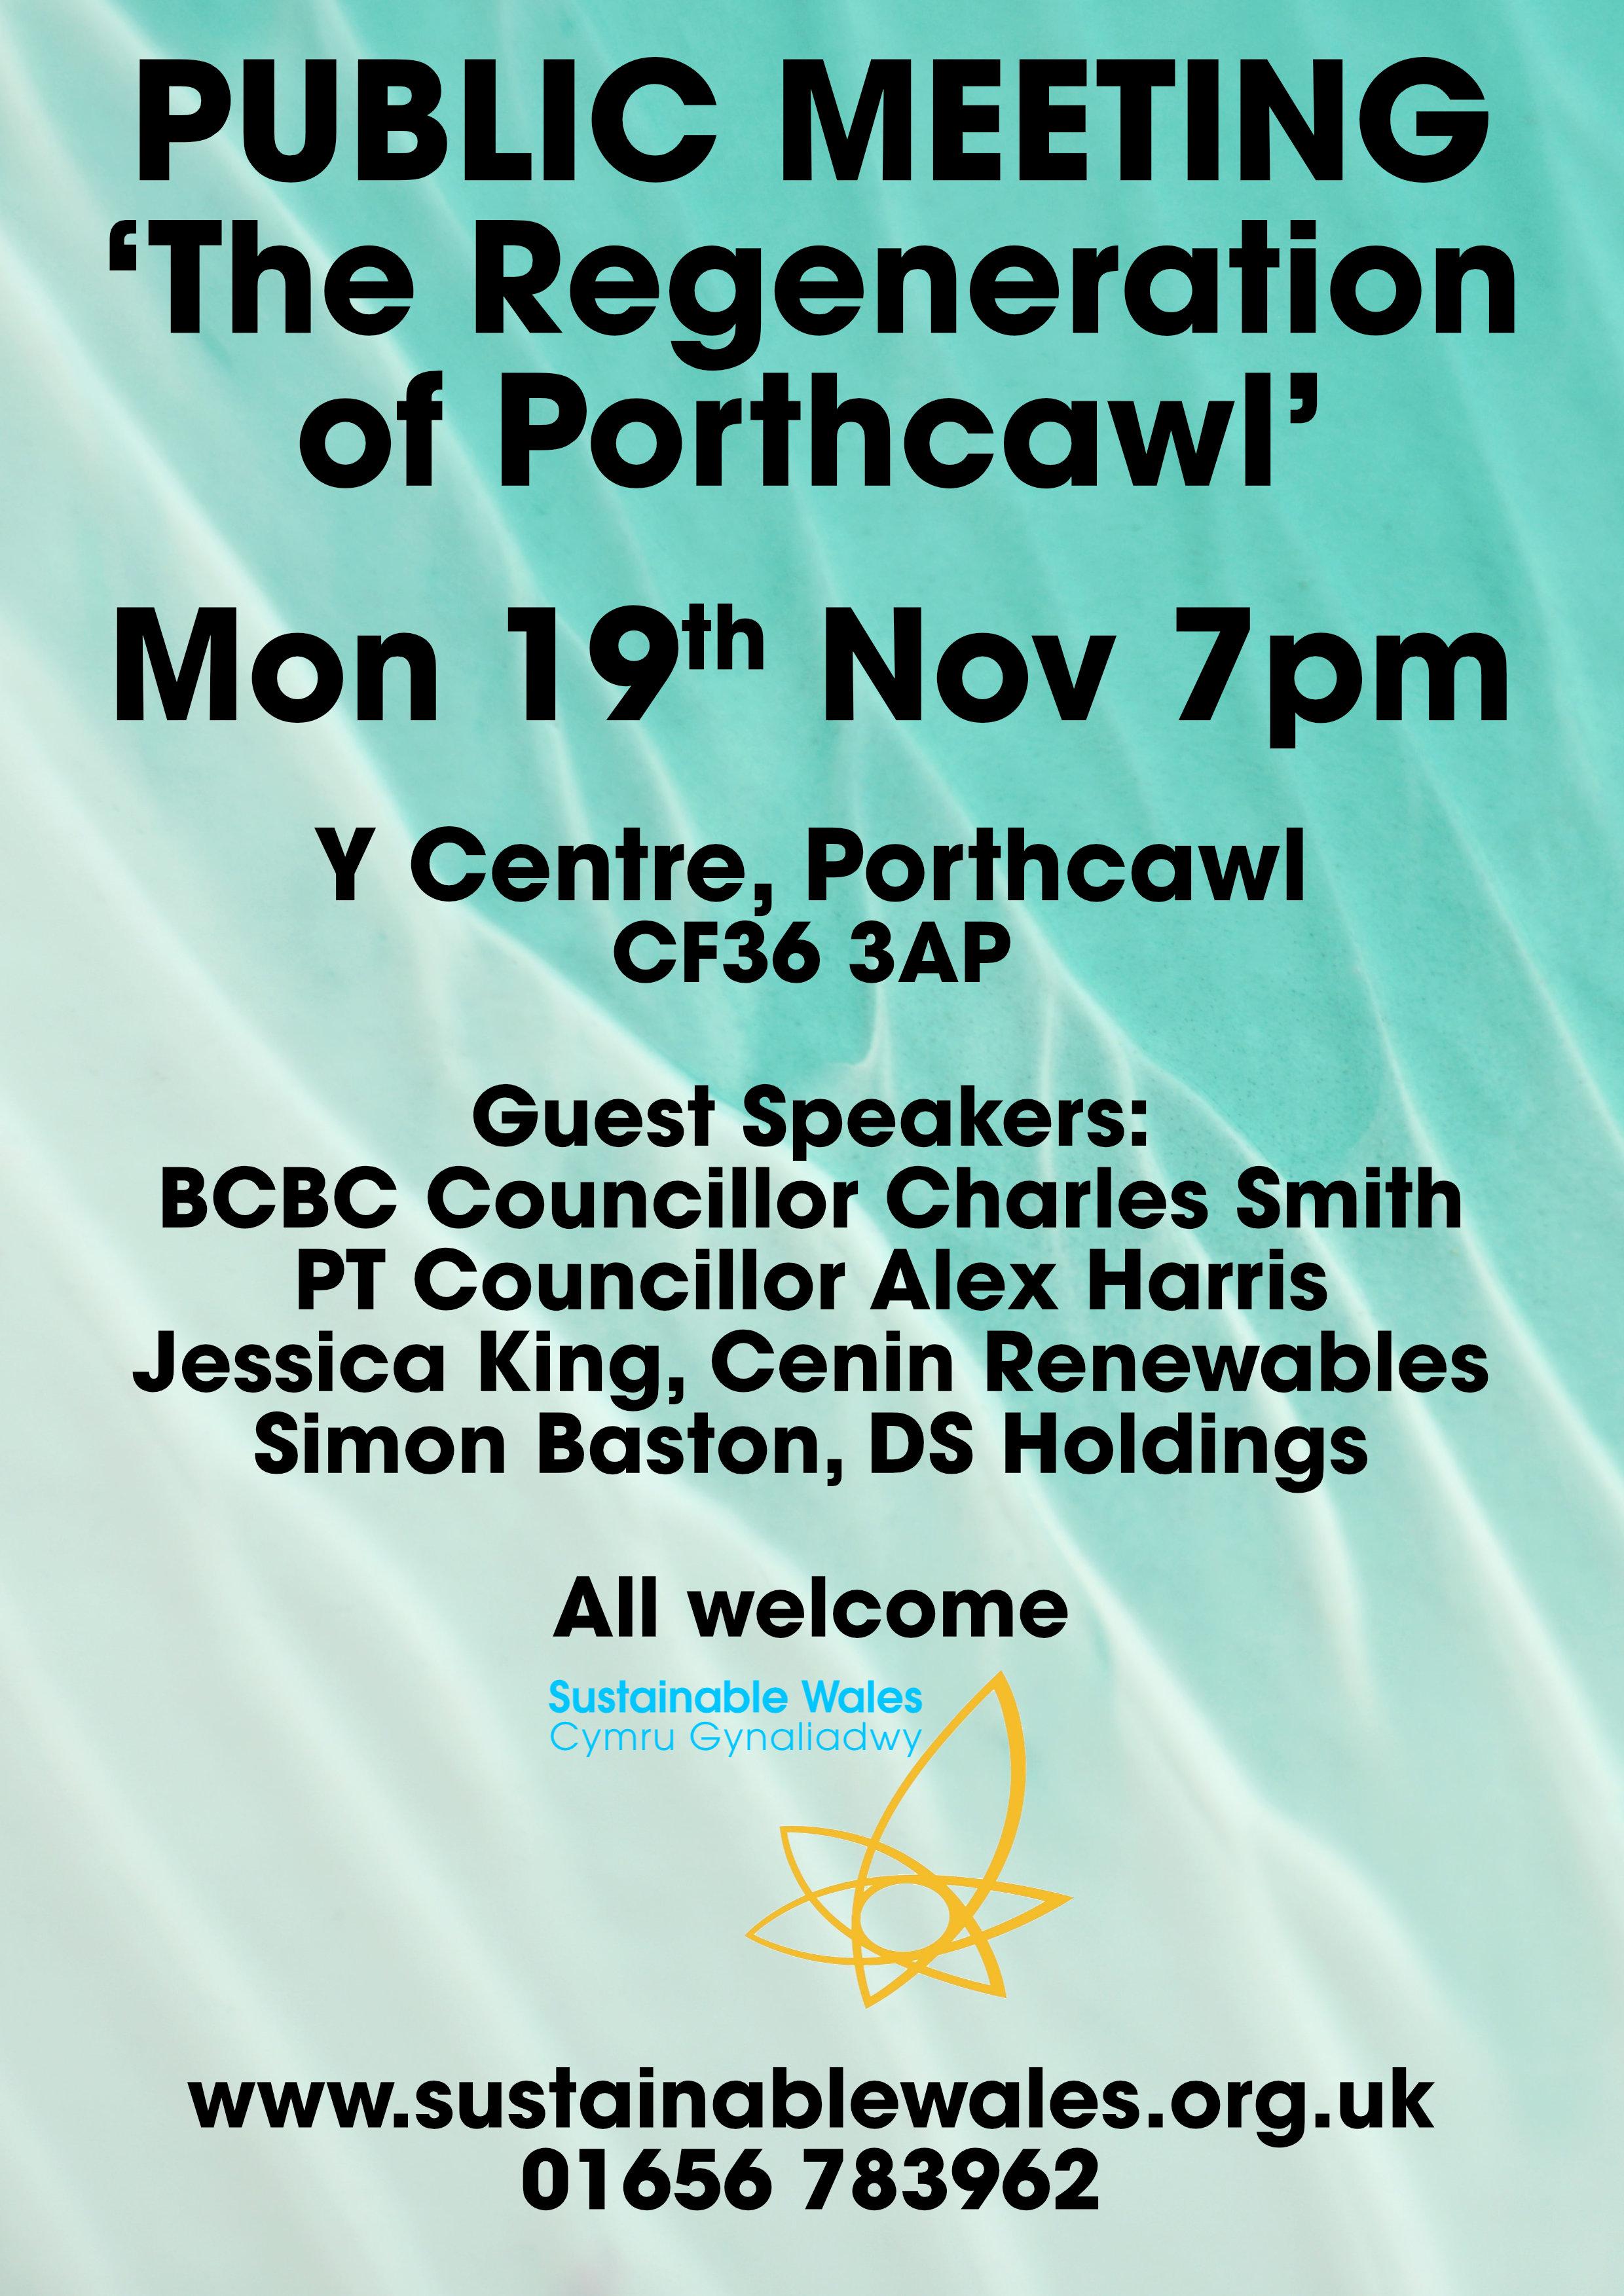 public meeting regen porthcawl 18  -2 alt.jpg